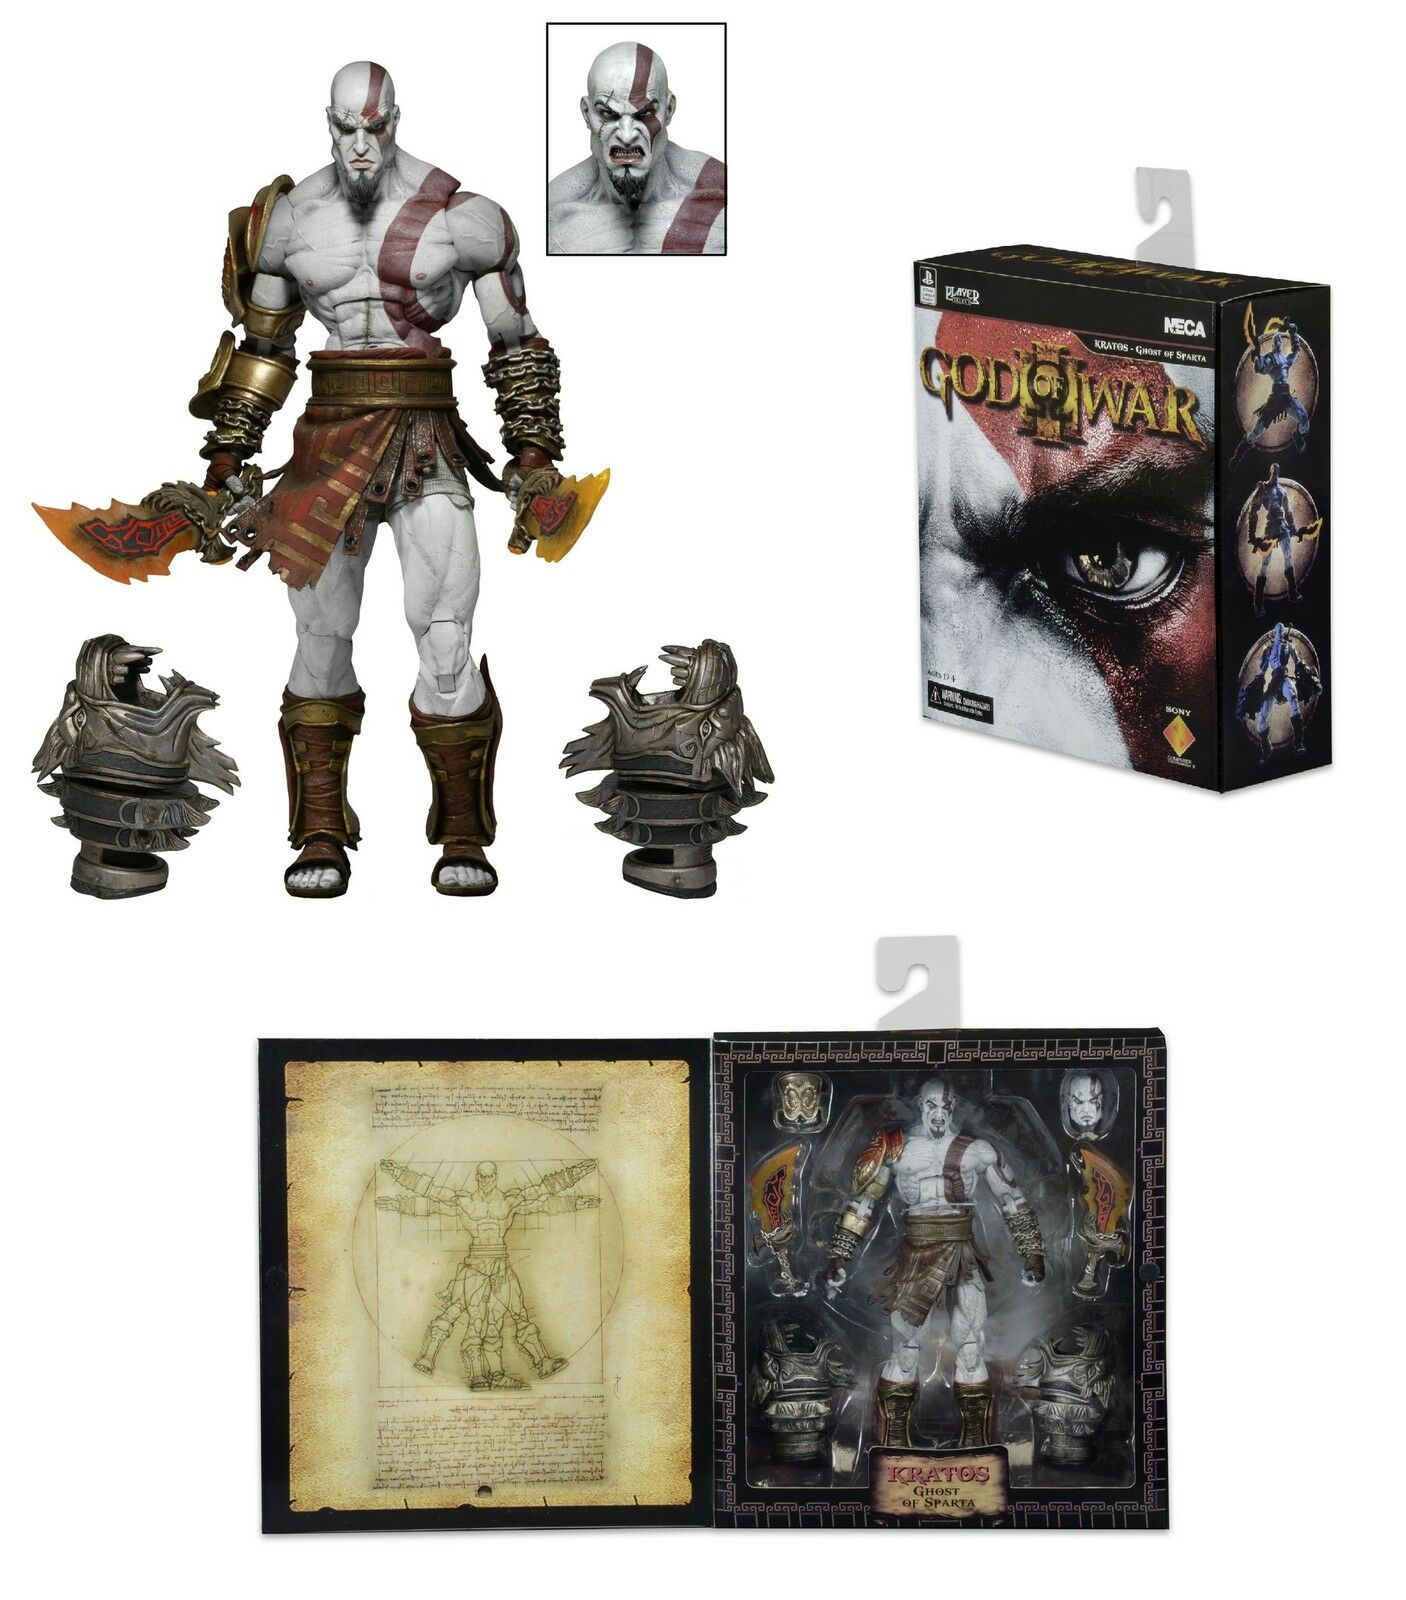 NECA GOD OF WAR III (3) Ultimate Kratos 7  Scale Figura Azione 2016